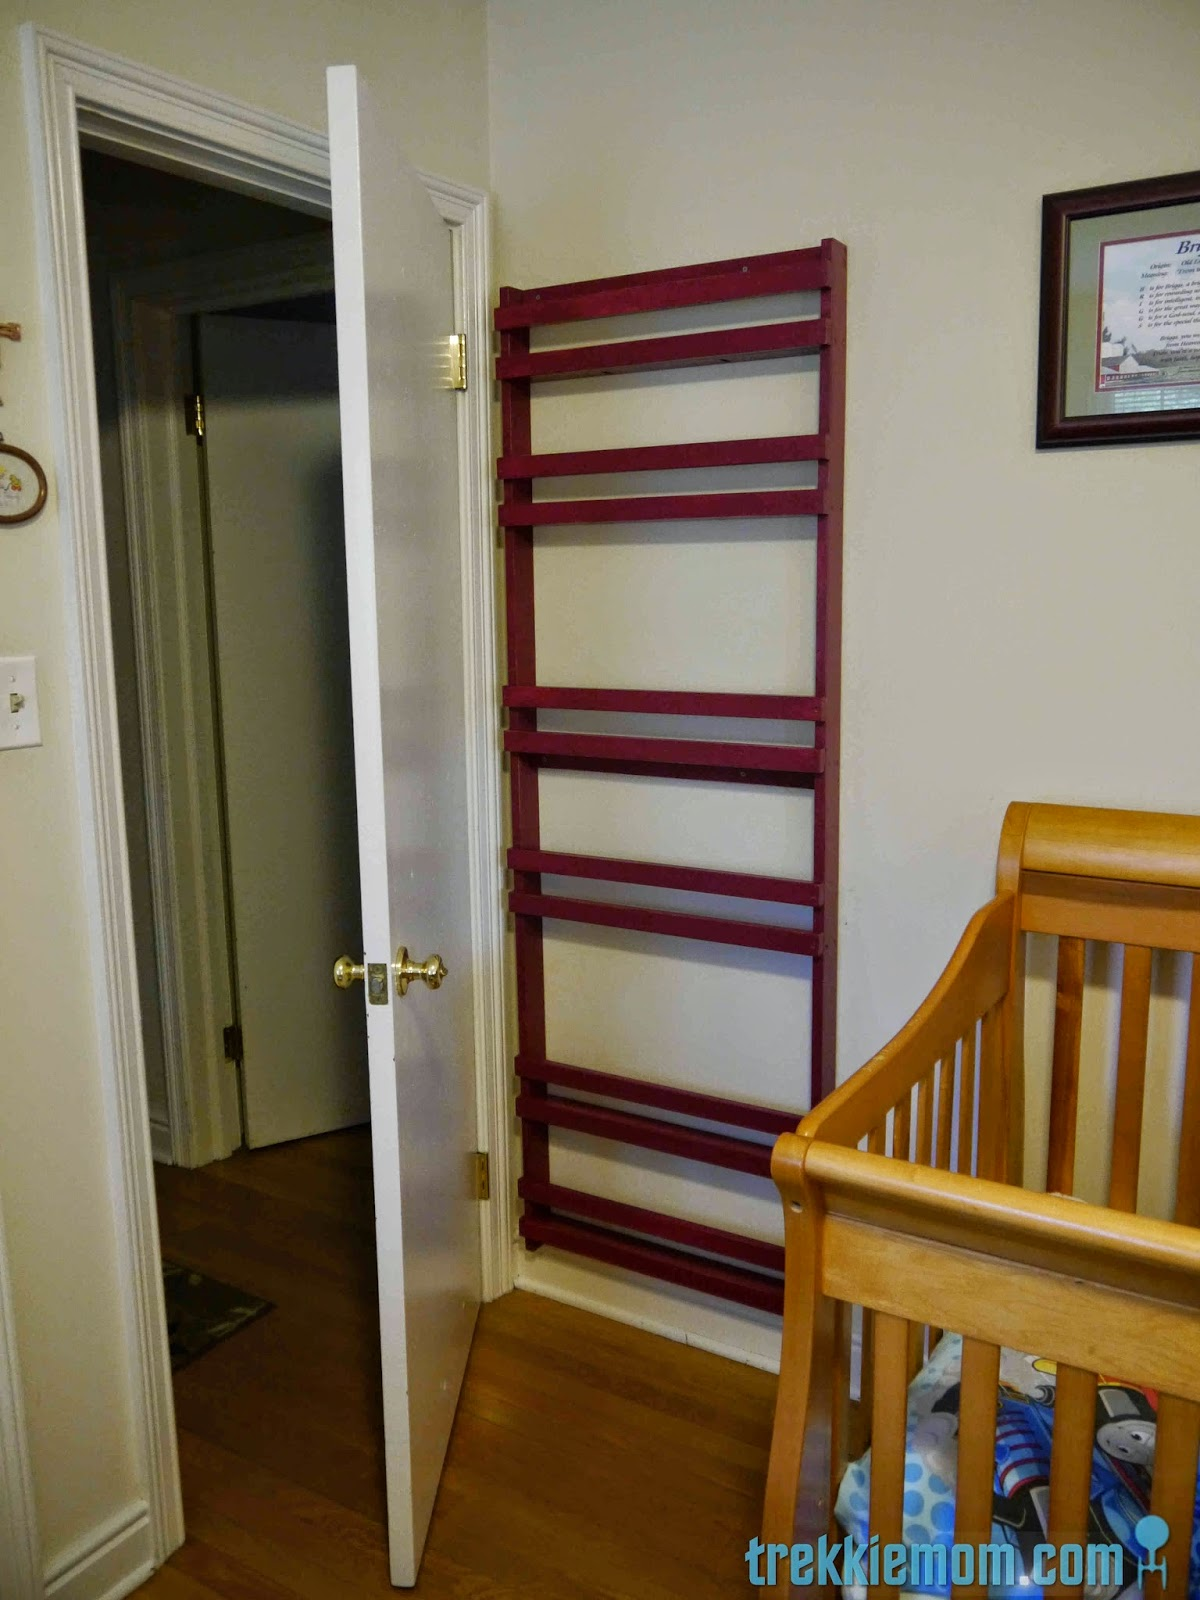 Trekkie Mom Flat Book Shelf How To